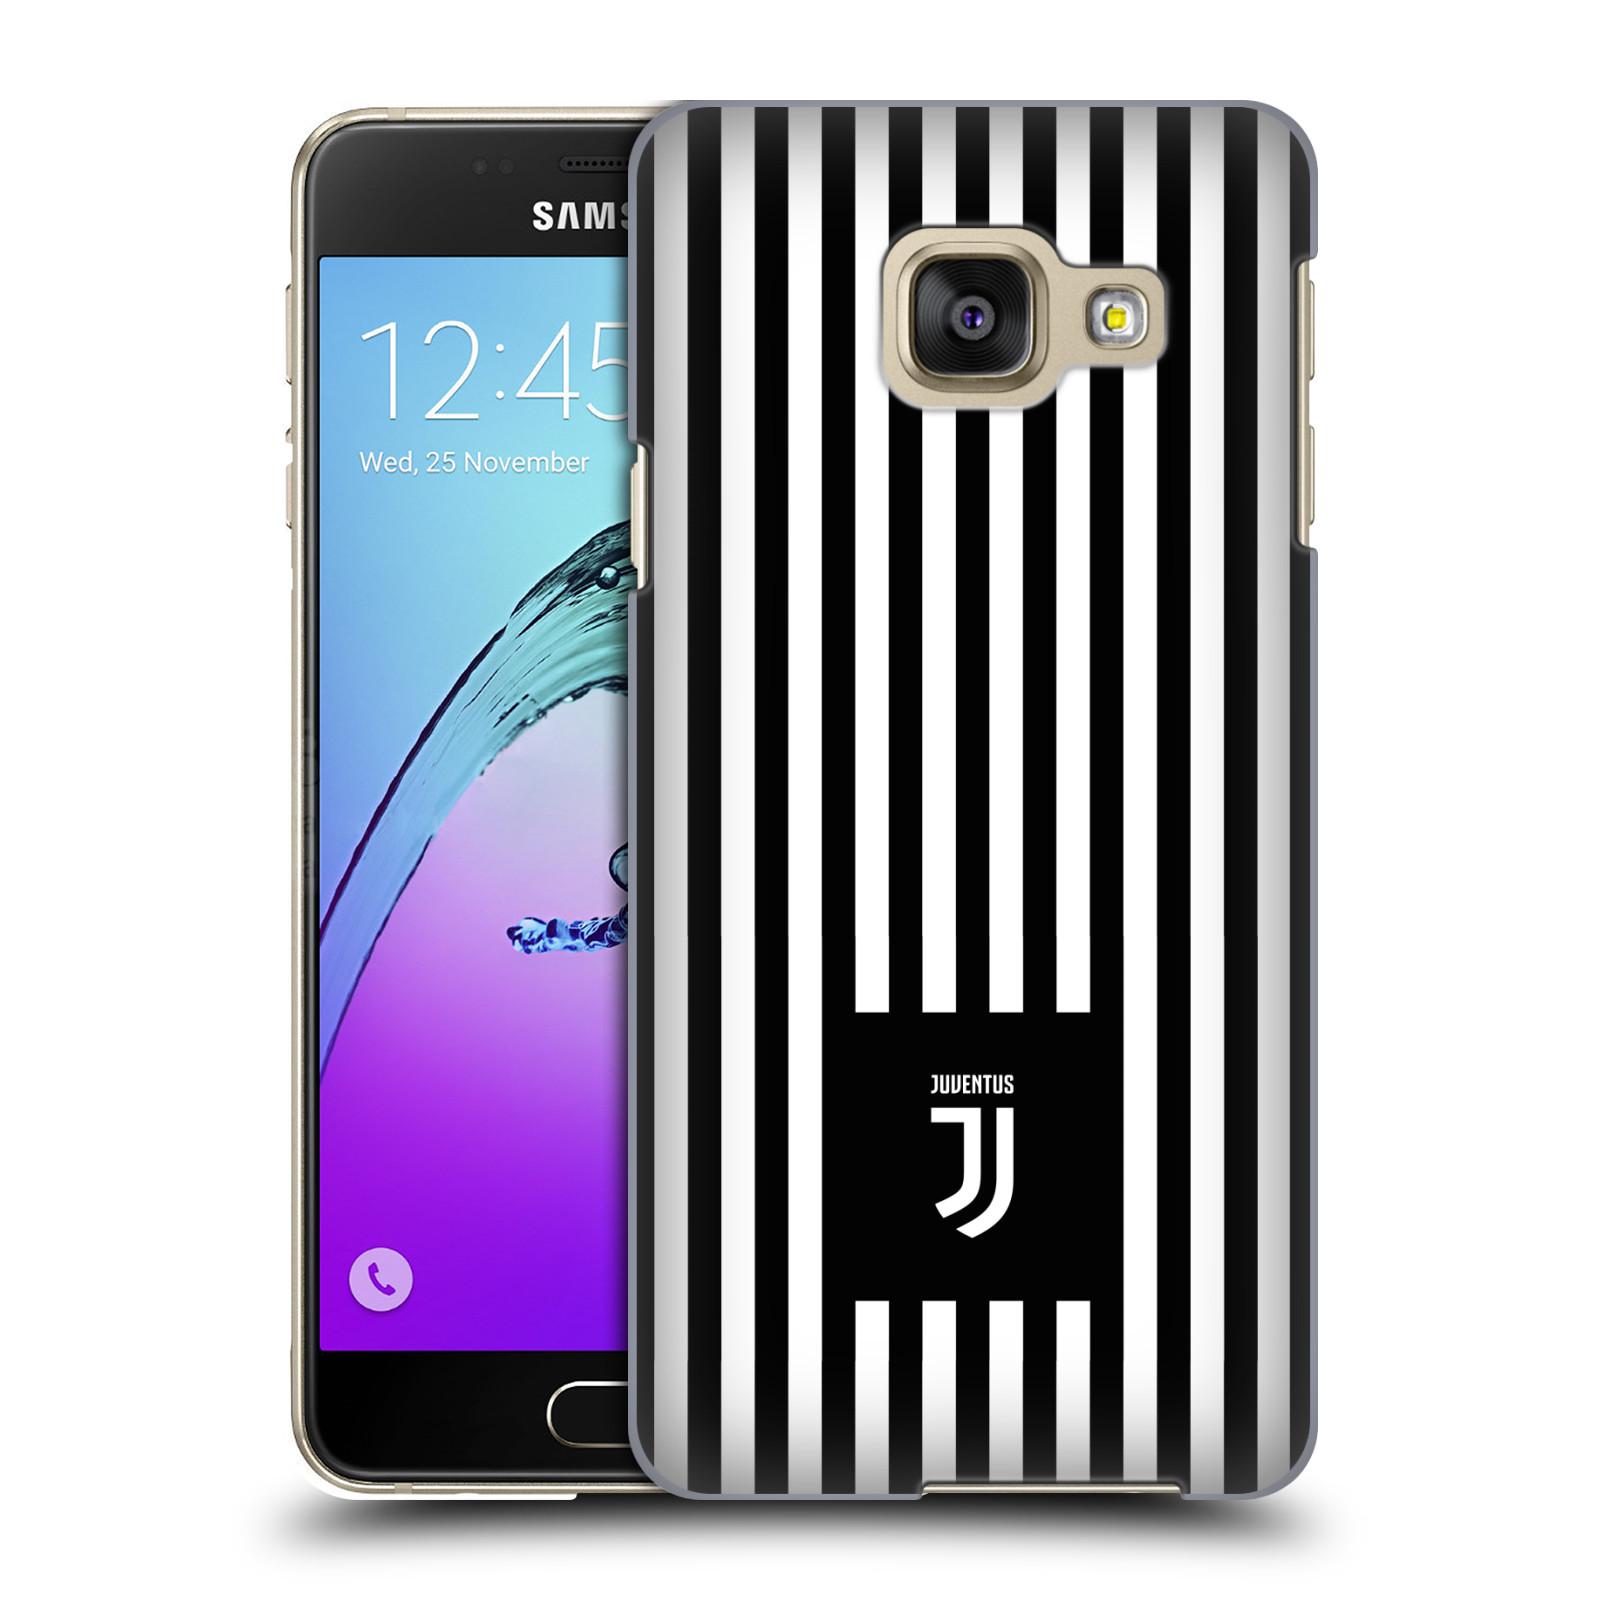 Plastové pouzdro na mobil Samsung Galaxy A3 (2016) - Head Case - Juventus FC - Nové logo - Pruhy